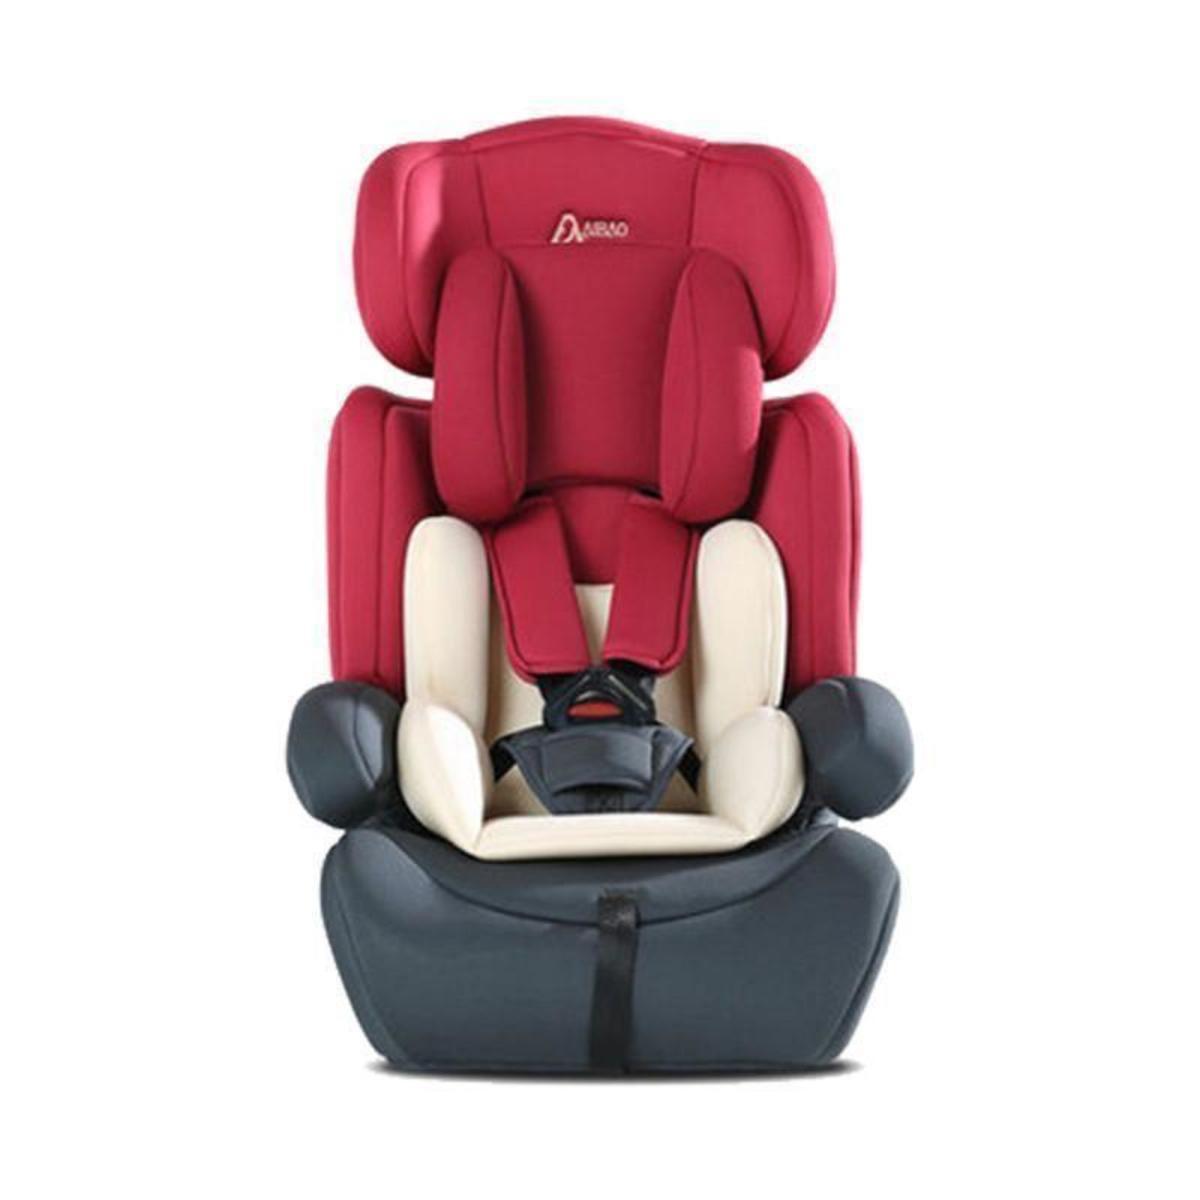 Aibao Aibo Child Car Seat (Multicolor) - Red gray